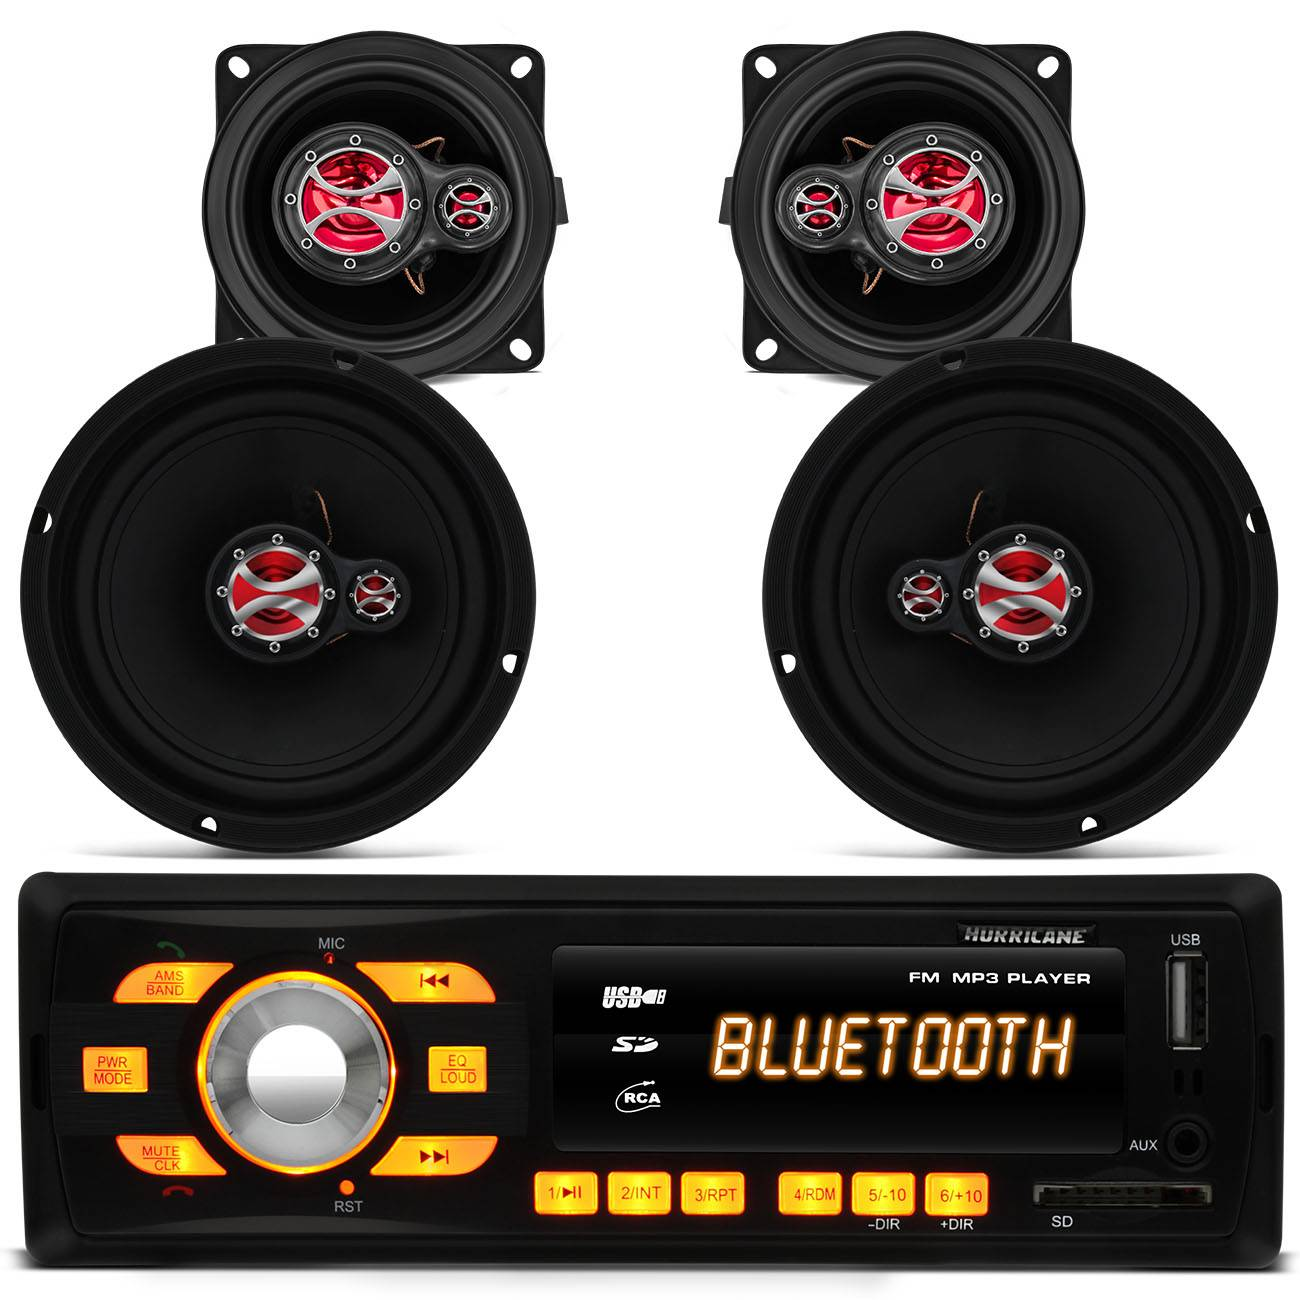 MP3 Player HR 414 Bluetooth USB + Kit Alto Falante Foxer 6 e 4 Polegadas 200 RMS Palio e Weekend G1